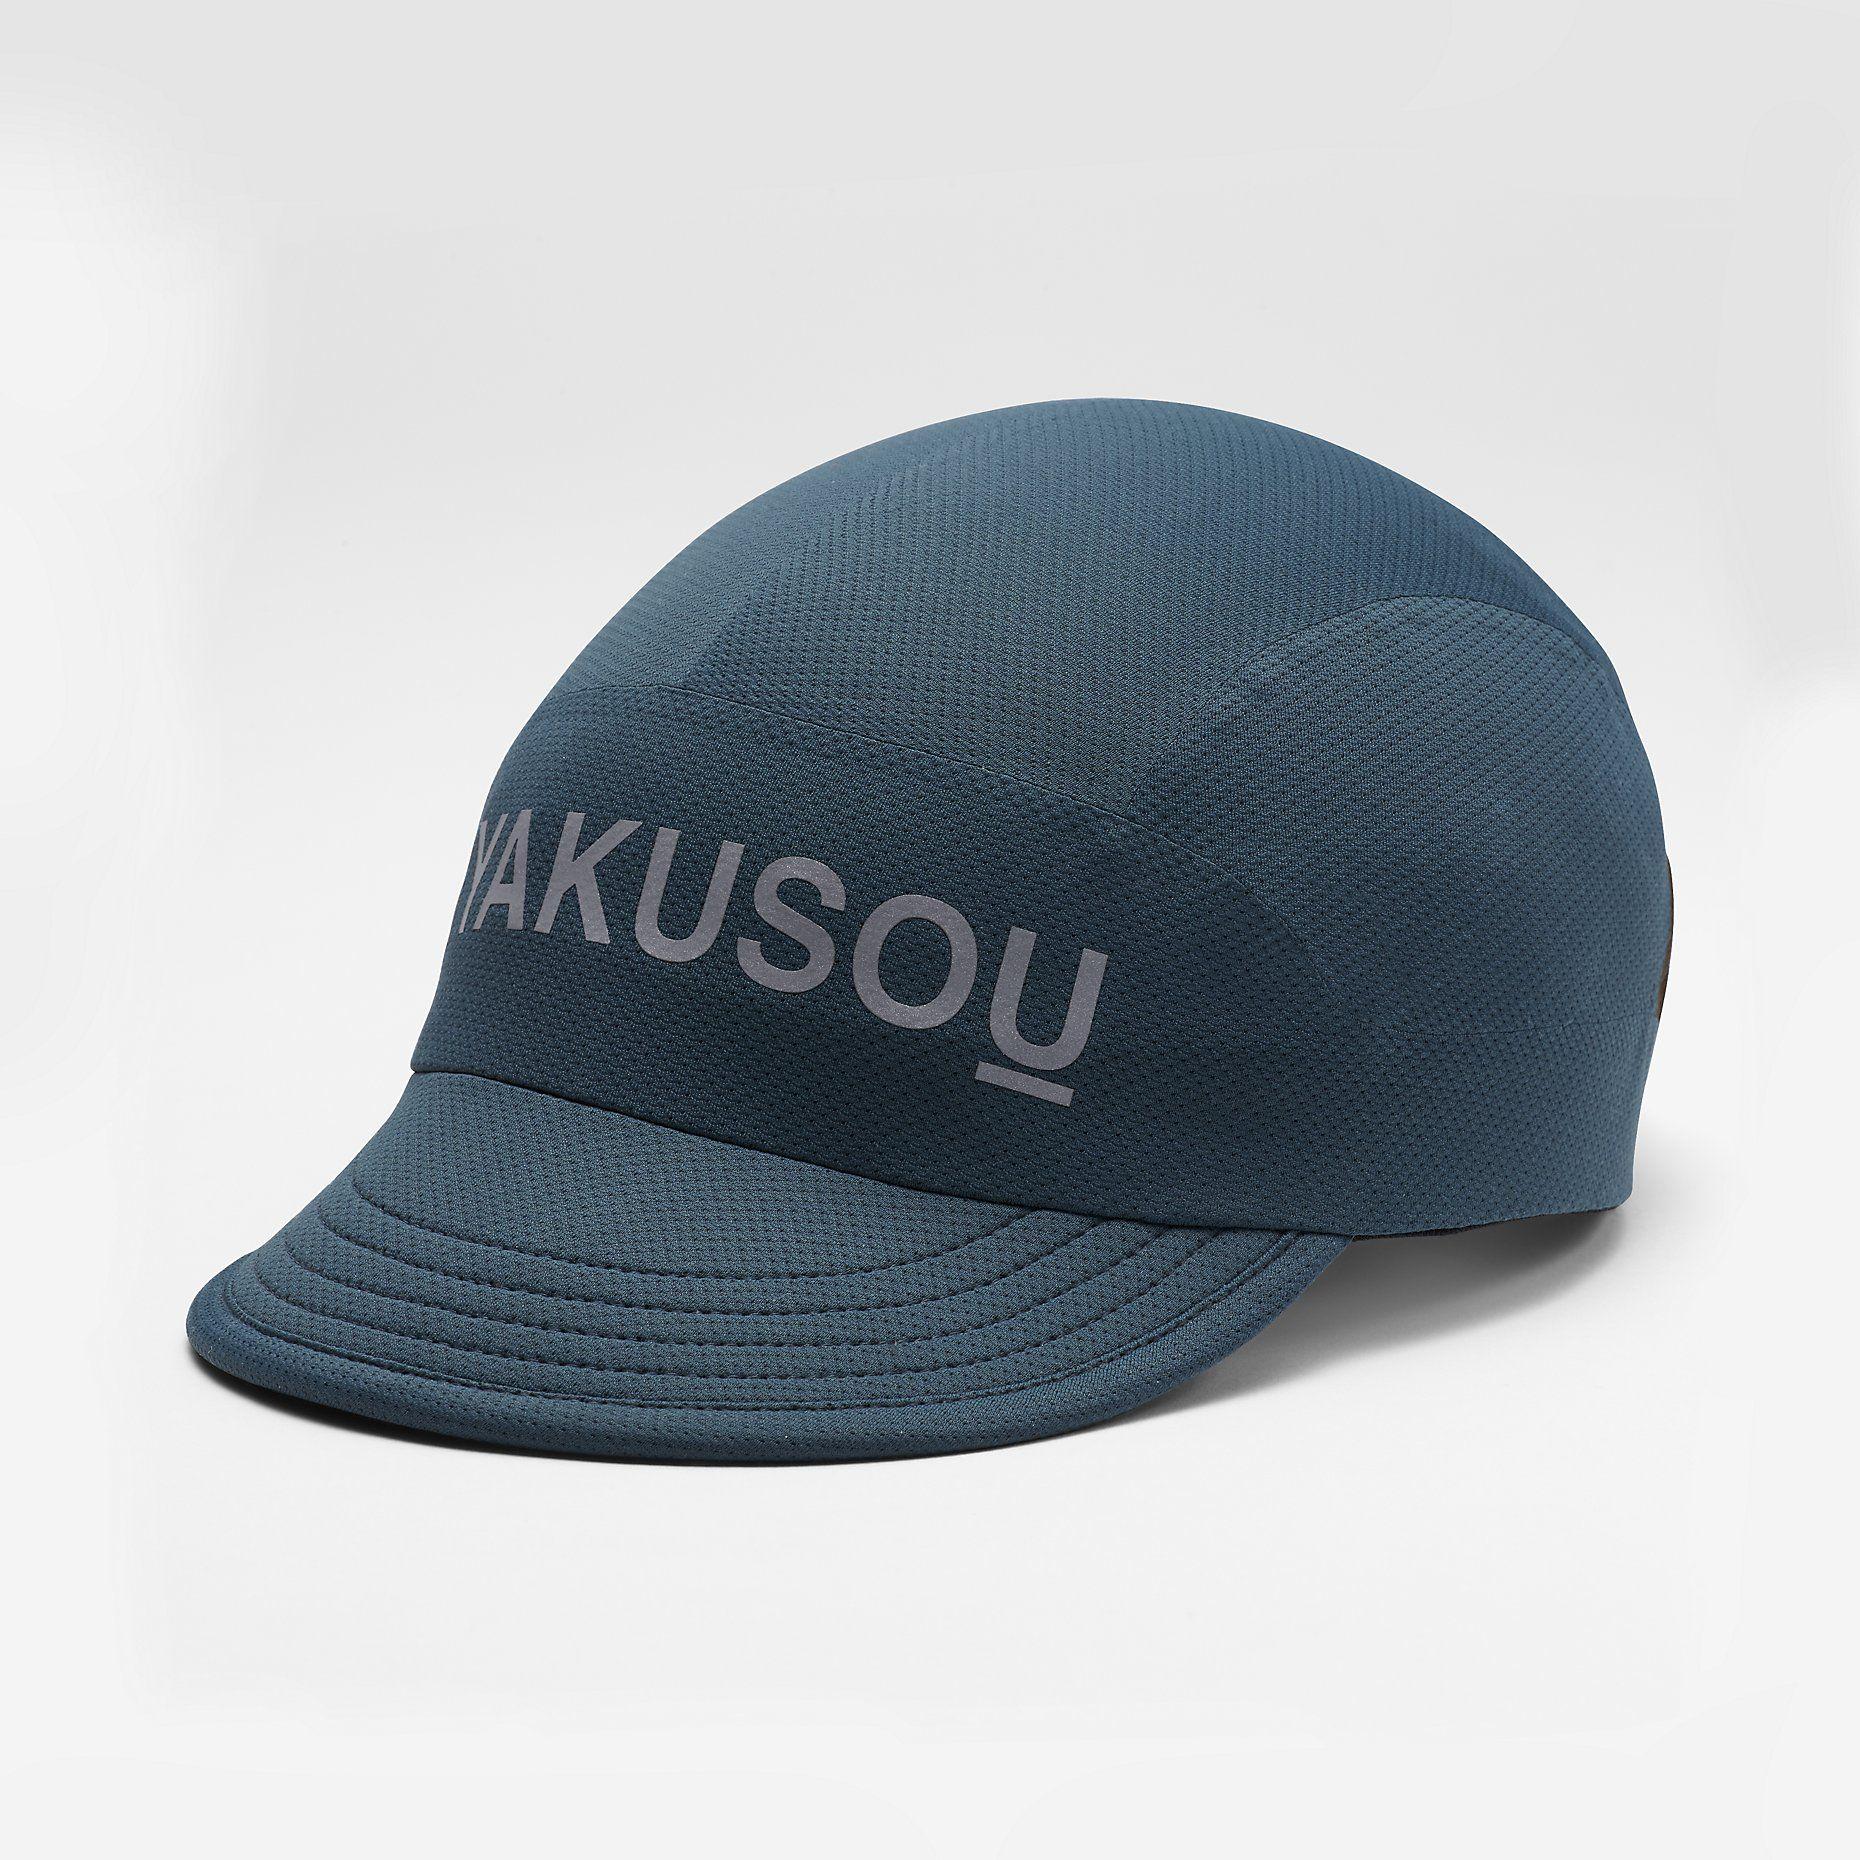 661f90539cb9 NIKELAB GYAKUSOU DRI-FIT MESH RACER CAP